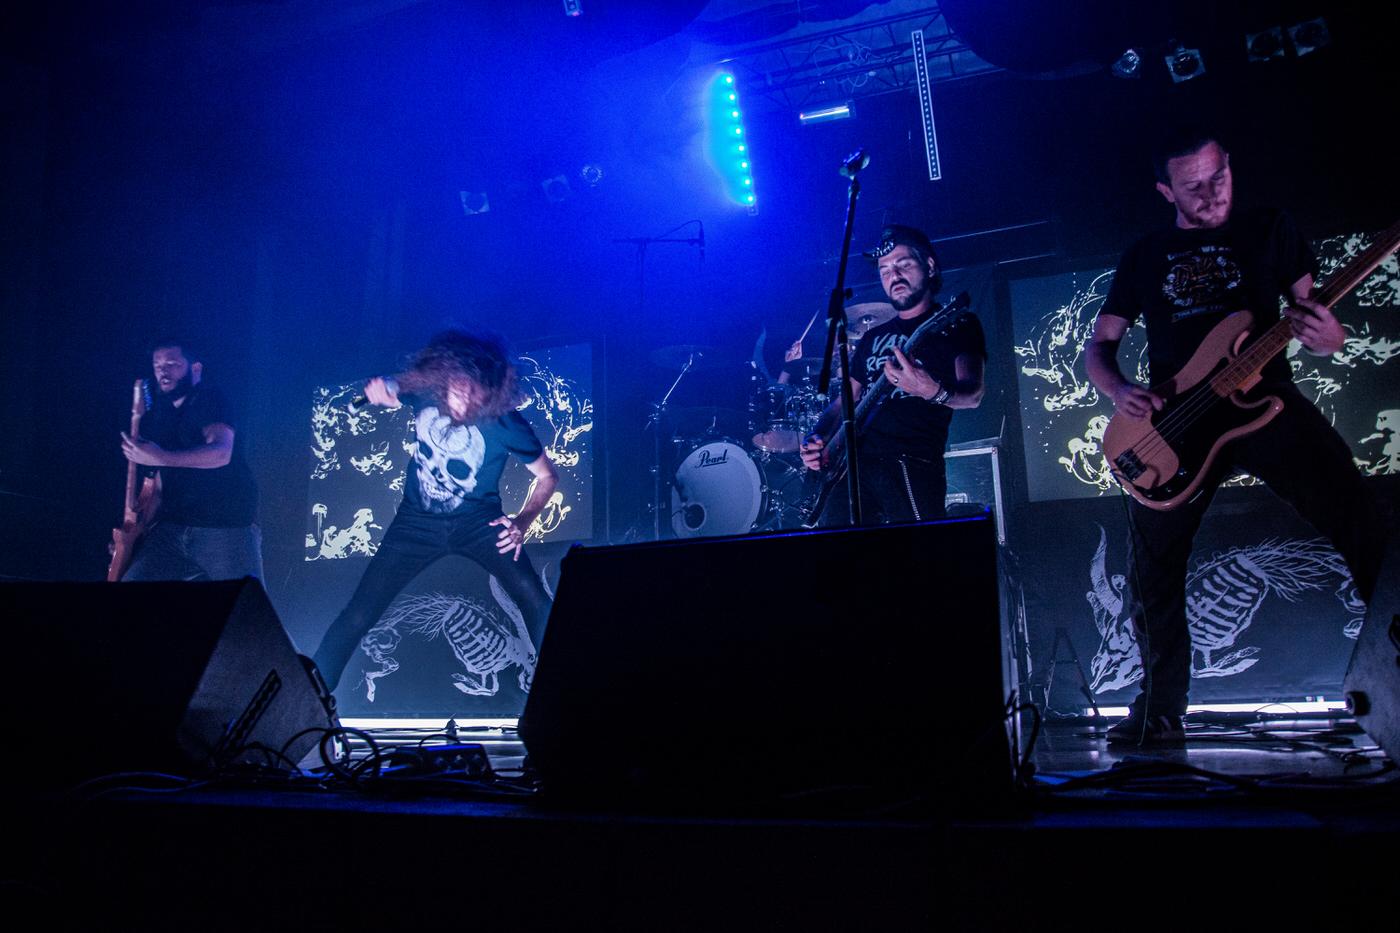 Sidilarsen en concert à Rock In Lucky